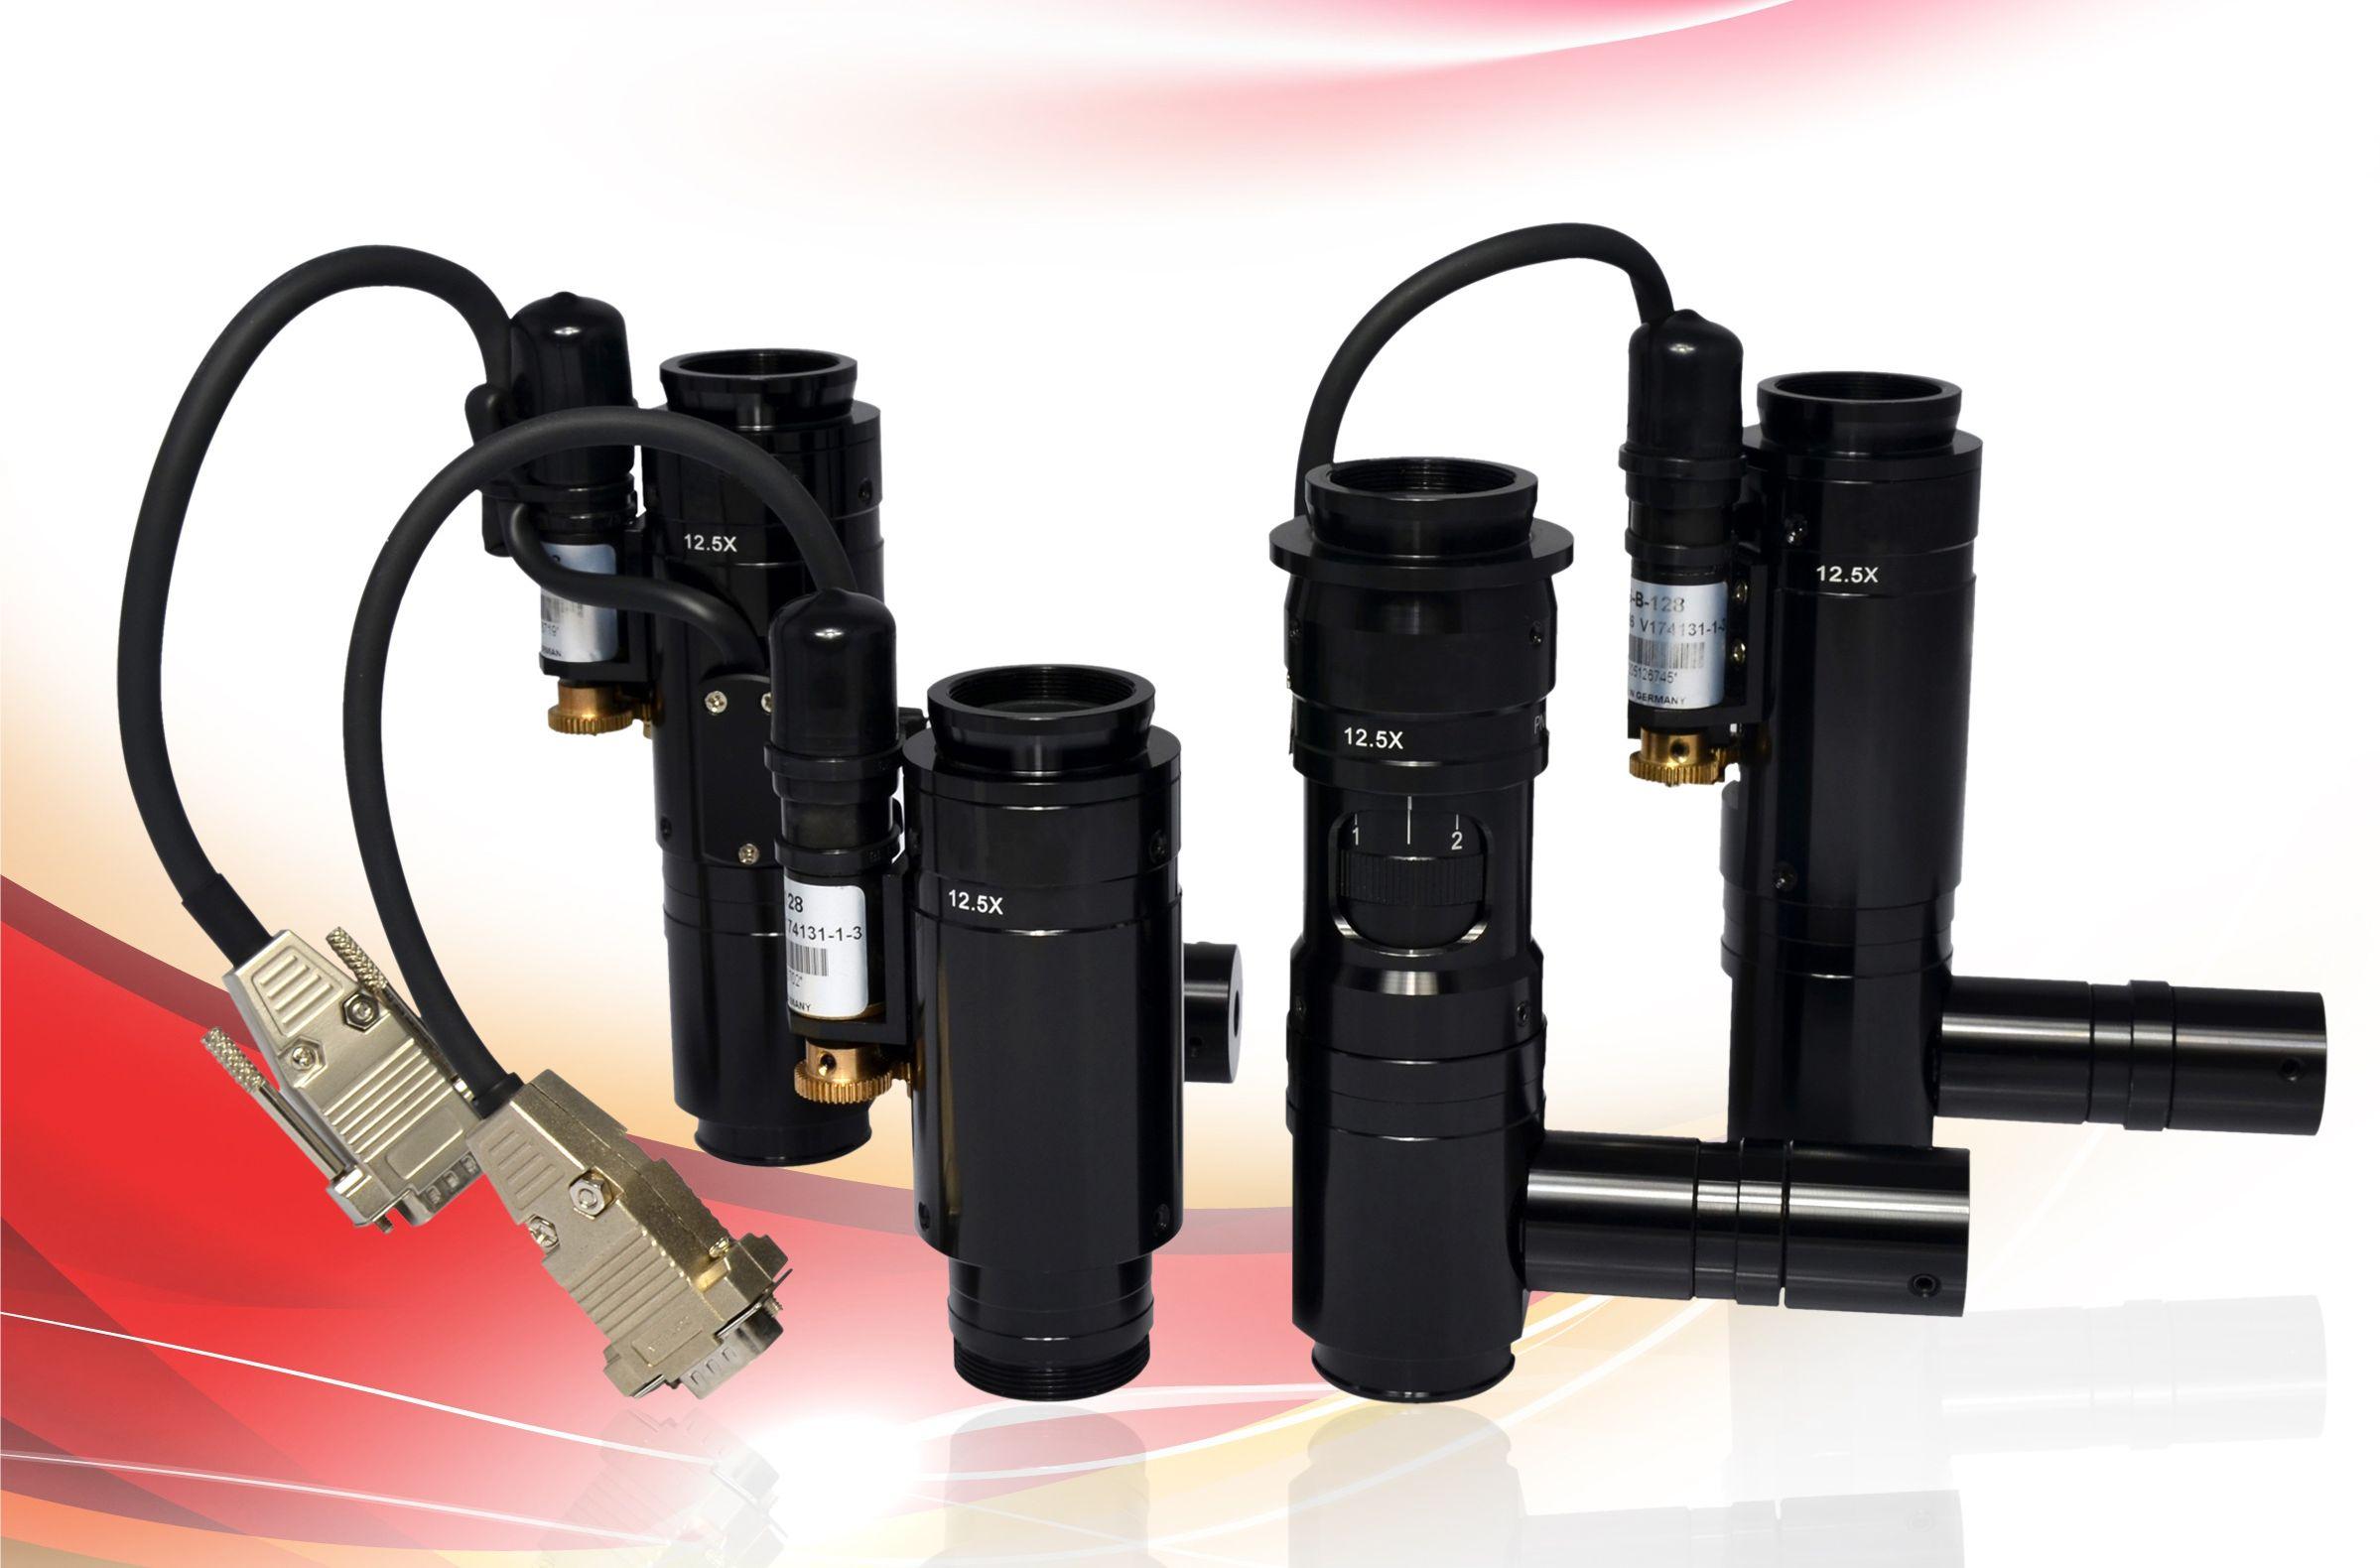 EHD Products: OPTEM Macrozoom Lenses Zoom70XL, Zoom125, Zoom160